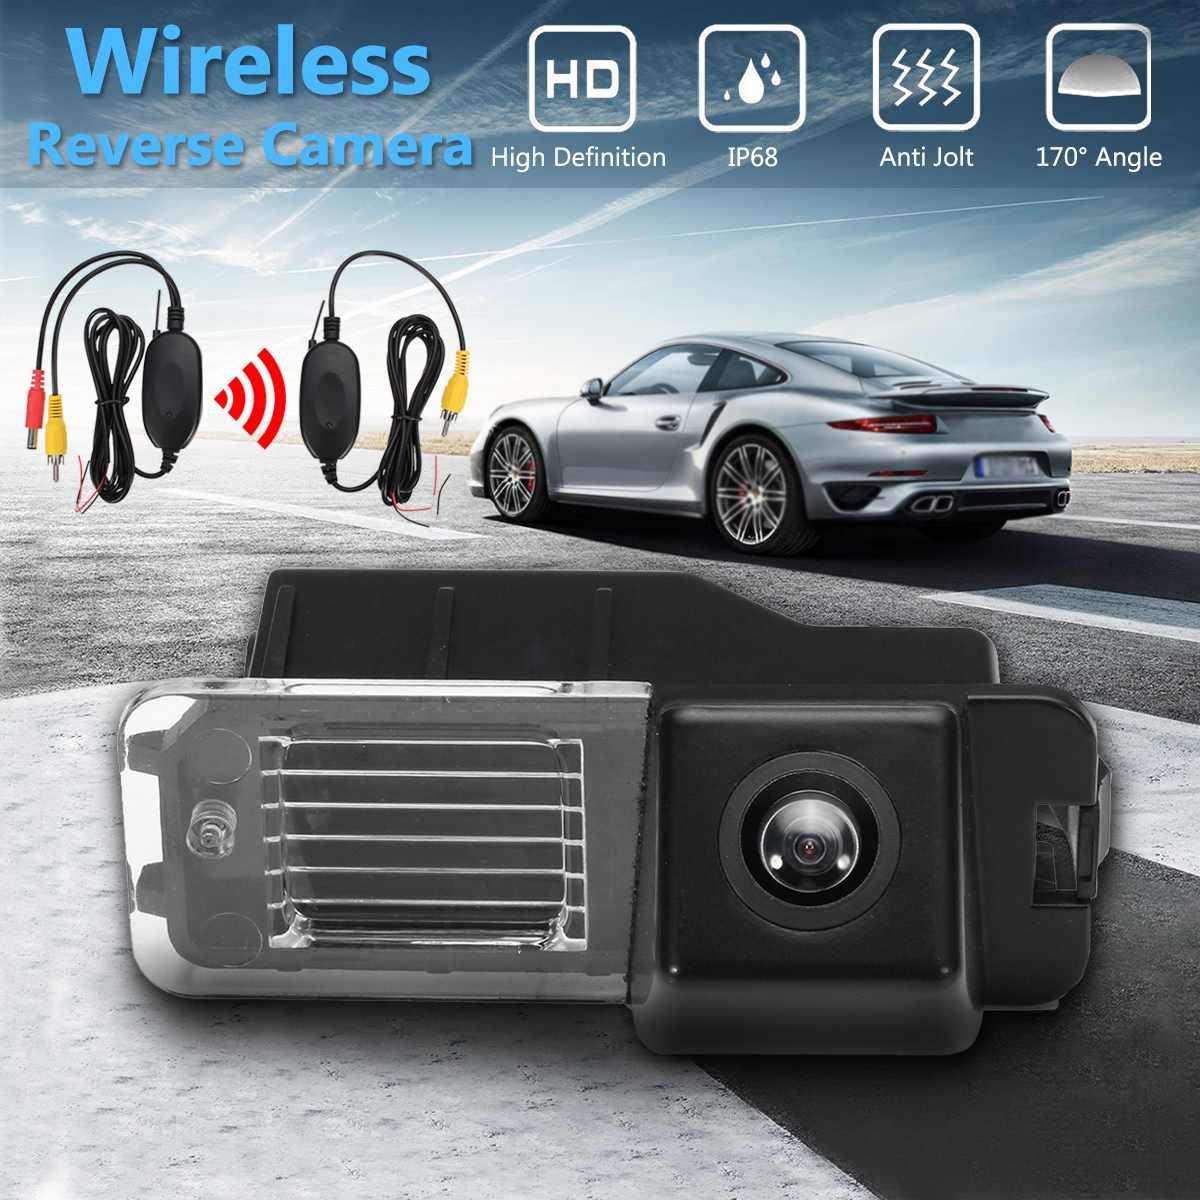 HD CCD Wireless Car Rear View Camera Reverse Backup For VW Polo V  6R  Golf VI Passat CC MK4 MK5 MK6 GTi R20